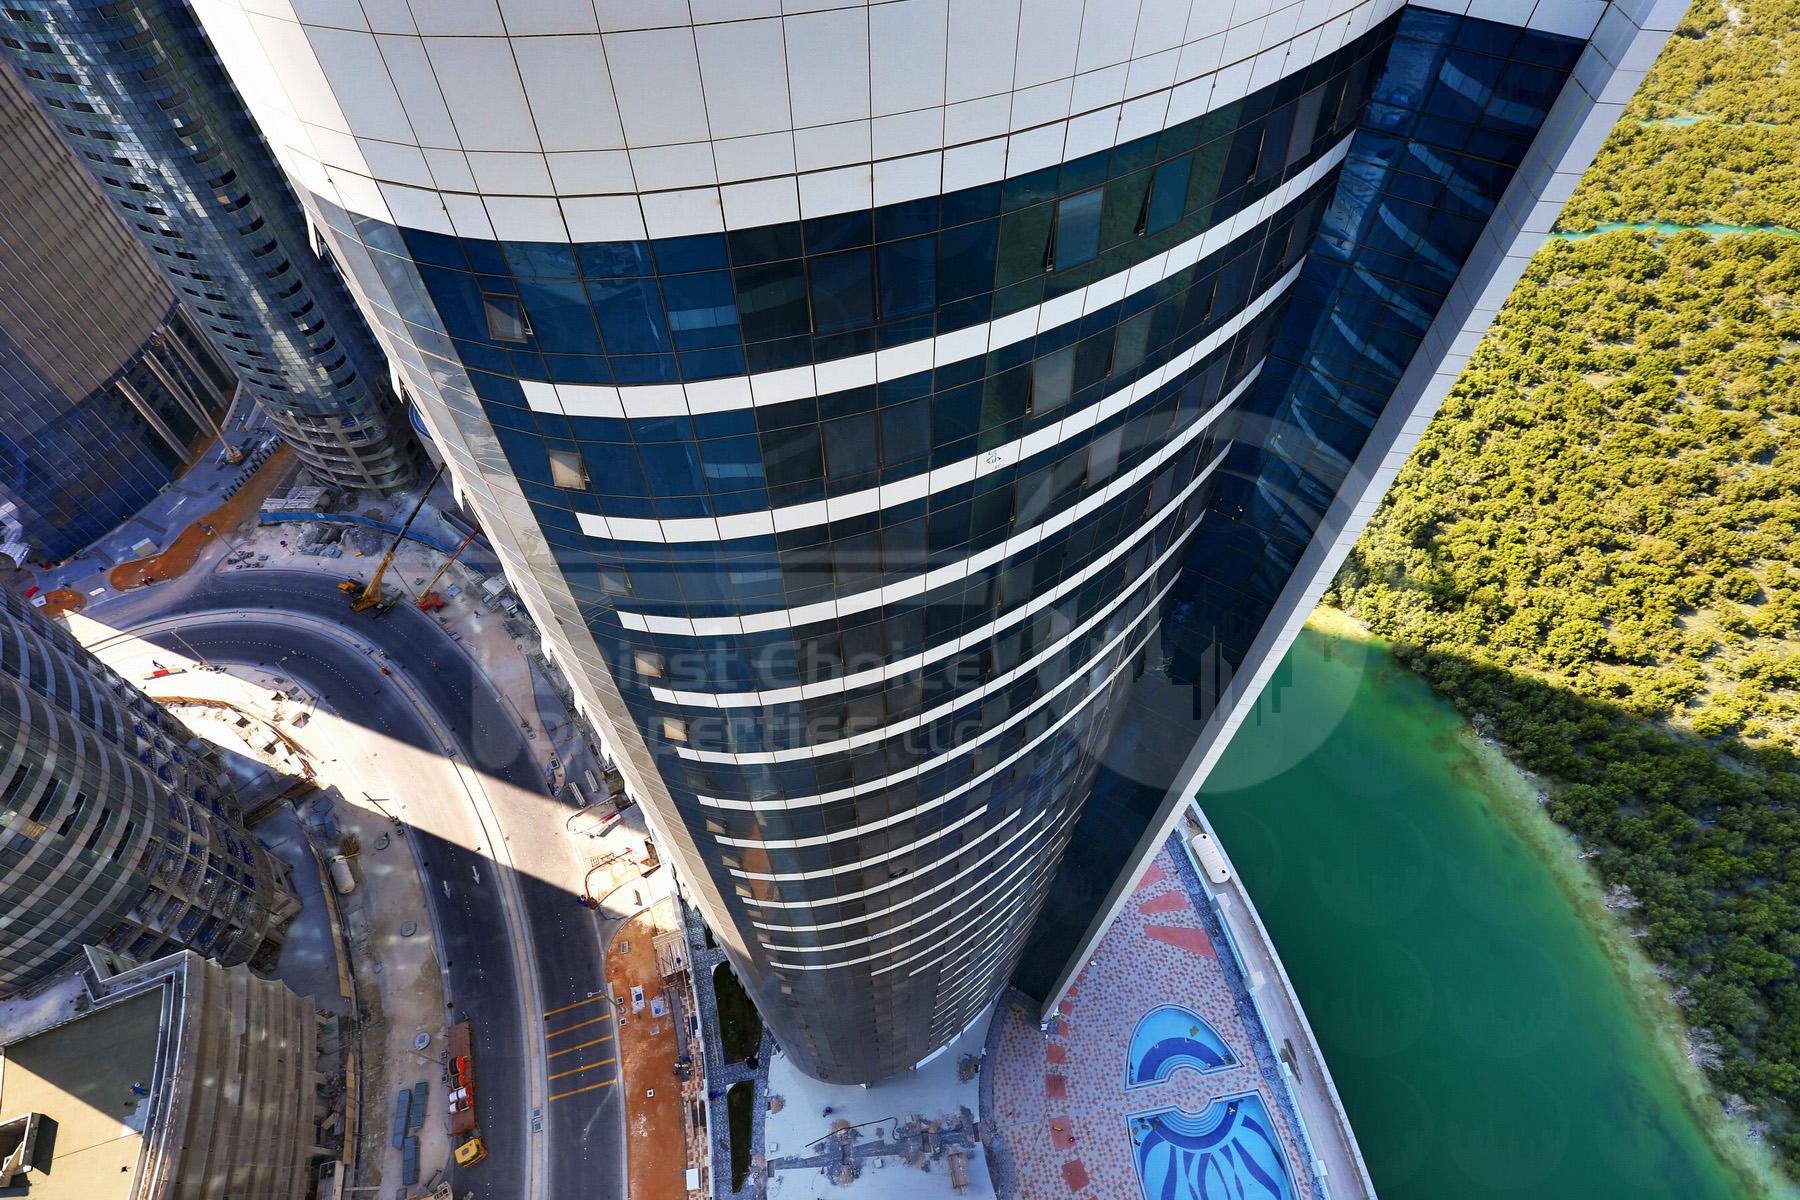 Studio - 1BR - 2BR - 3BR - 4BR Apartment - Abu Dhabi - UAE - Al Reem Island - Hydra Avenue - Outside View (47).JPG